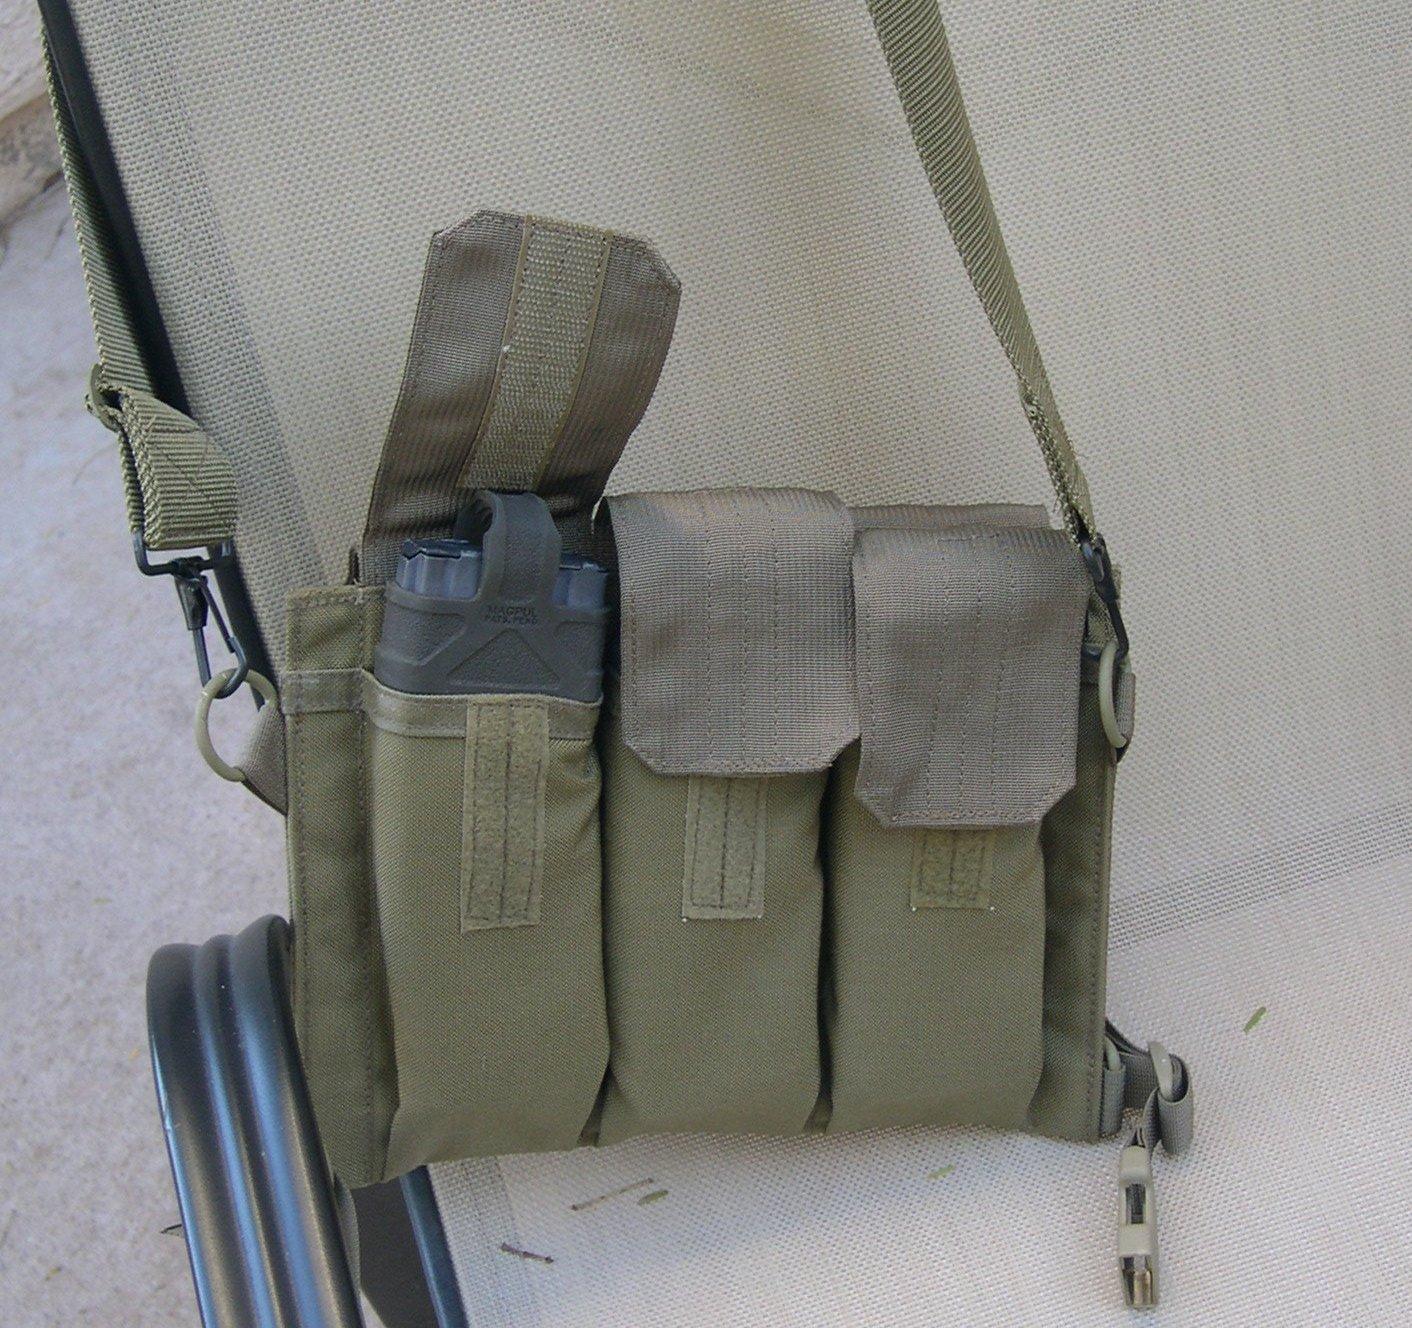 Bandoleer Pouch for the Defensive Rifle-patrol-bandoleer_r.jpg